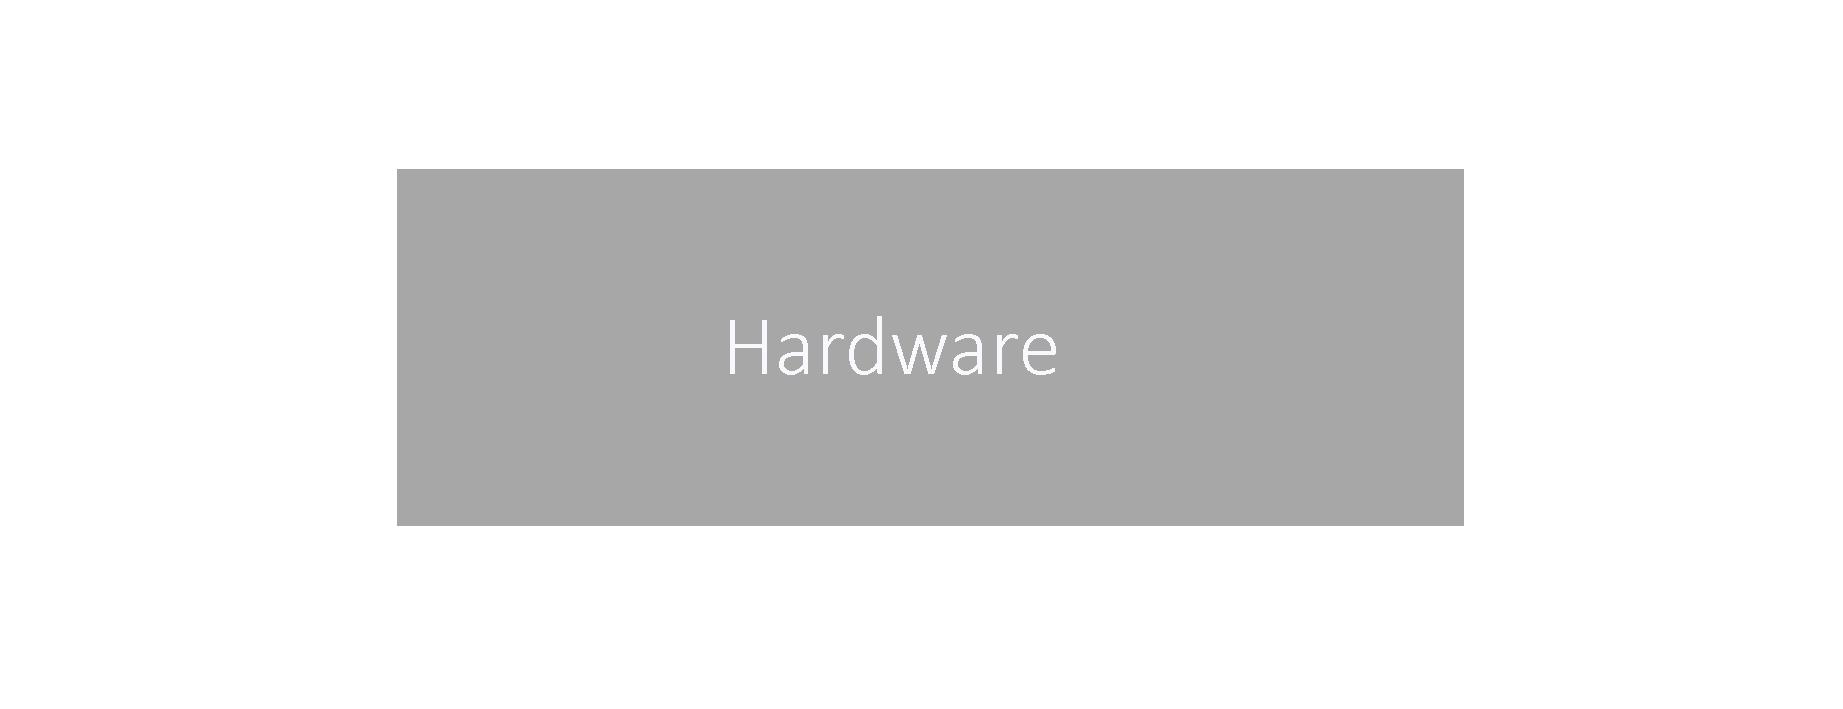 Hardware Microsoft Teams, Headsets Microsoft Teams, Telefone für Microsoft Teams